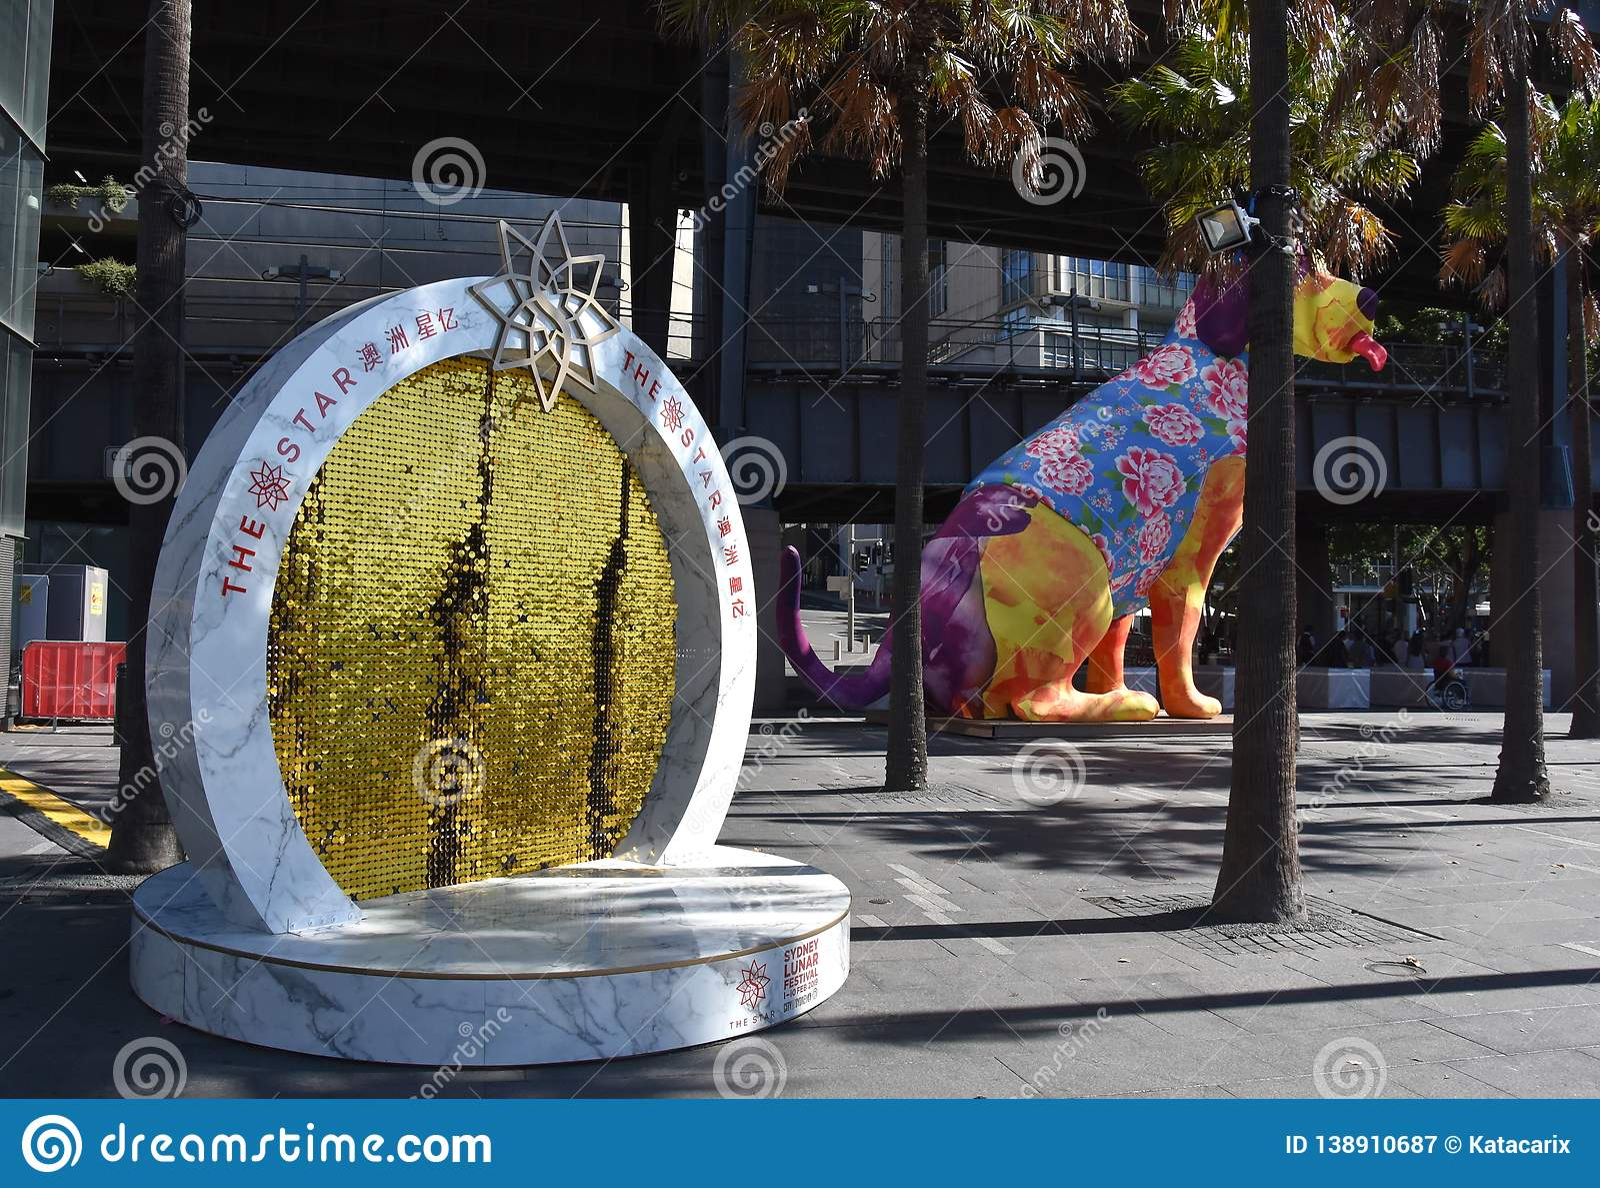 Larger than life lanterns in the shape of Dog. Chinese zodiac animals at Circular Quay